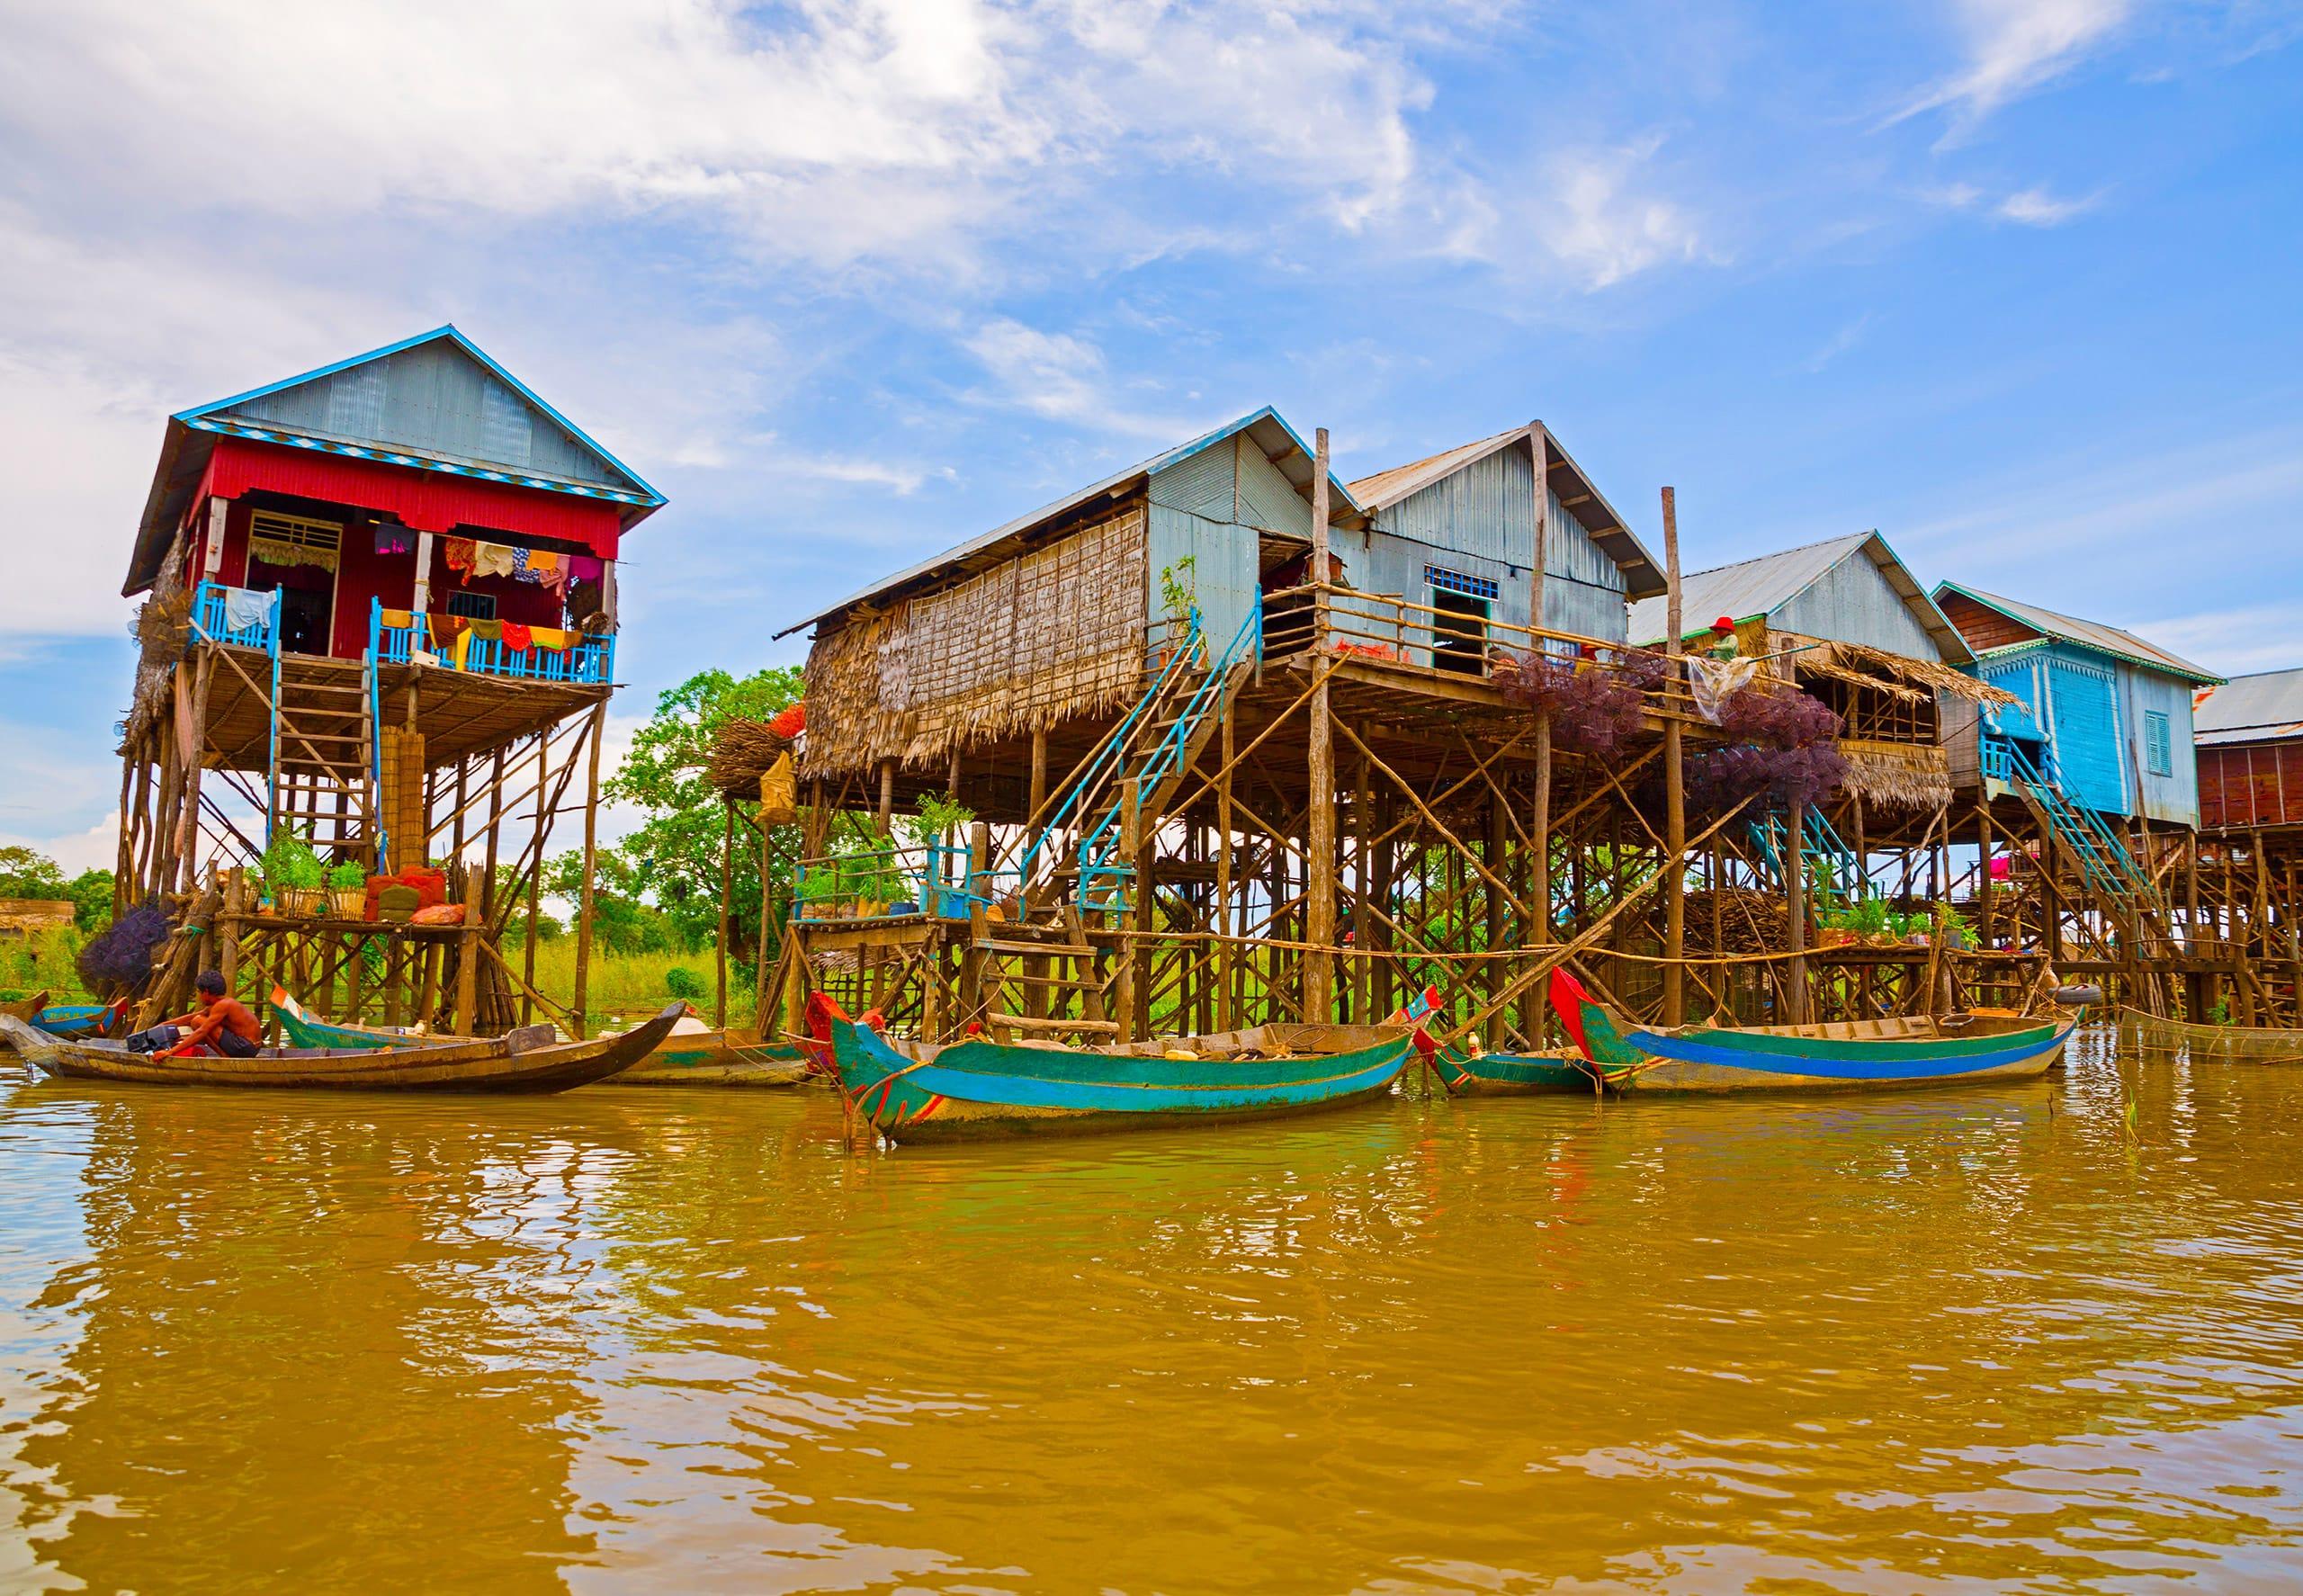 15-daagse privé rondreis met chauffeur Kleurrijk Cambodja en Koh Chang